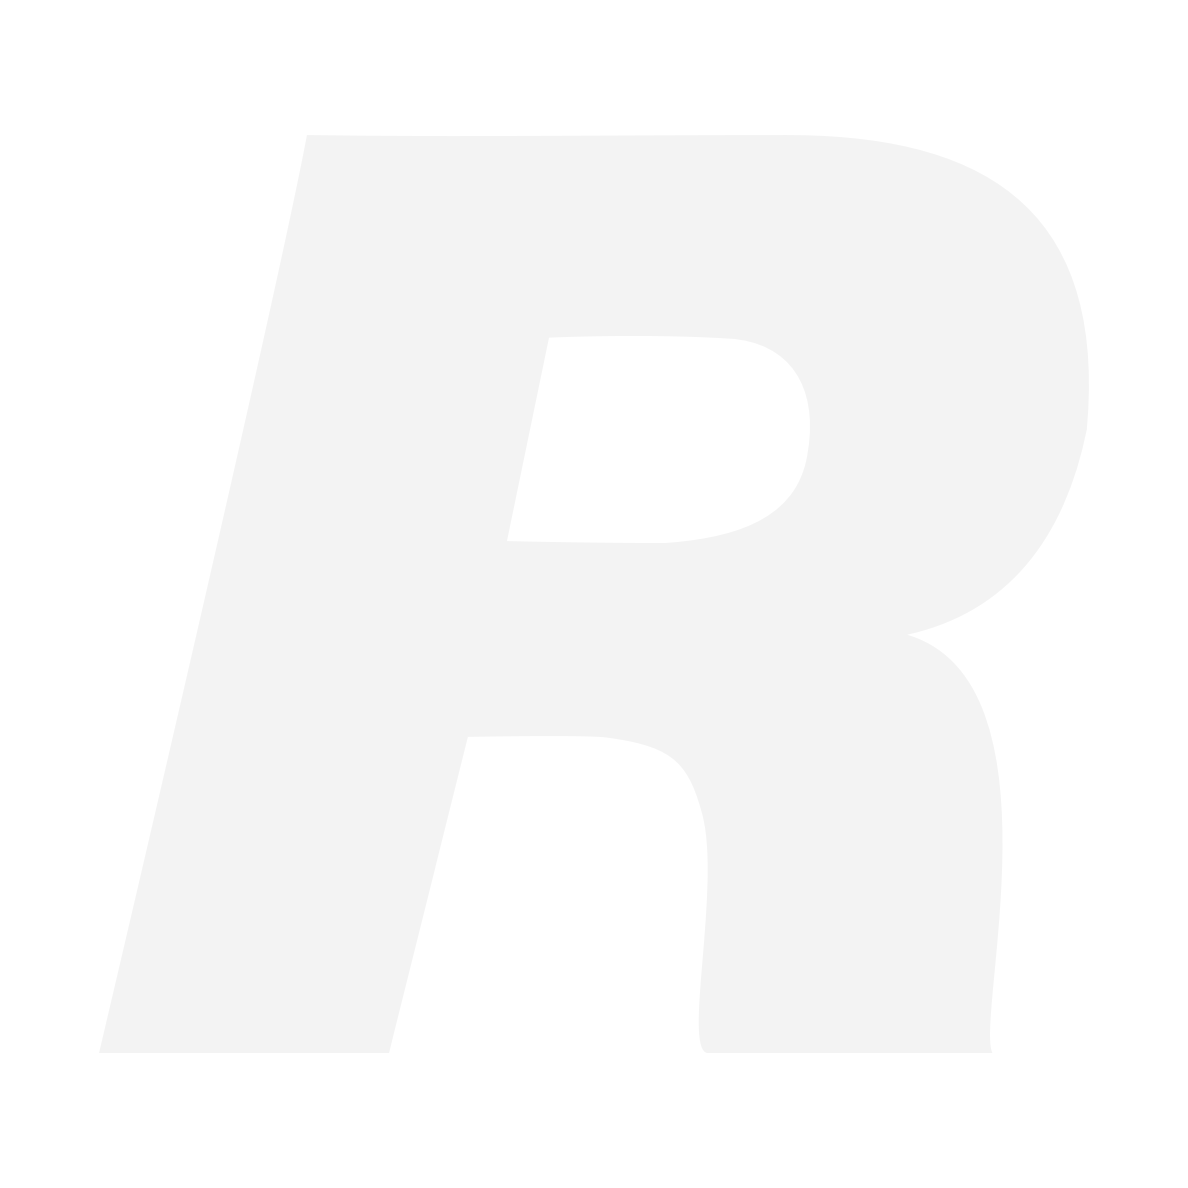 Leica Rangemaster 1600-R CRF